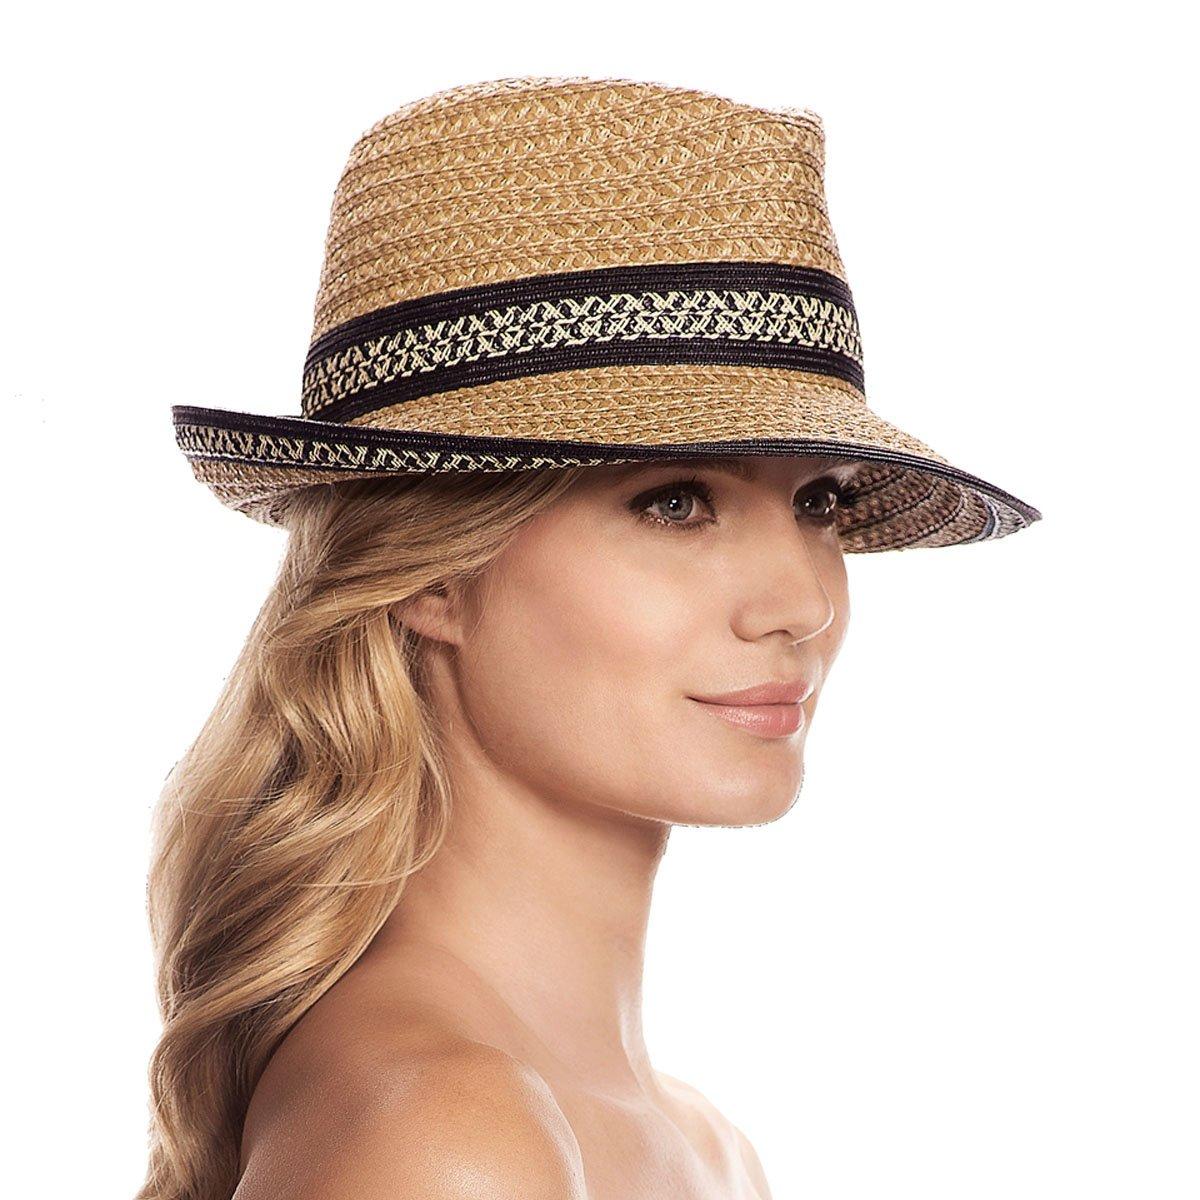 Eric Javits Luxury Fashion Designer Women's Headwear Hat - Big Deal - Natural Black Mix